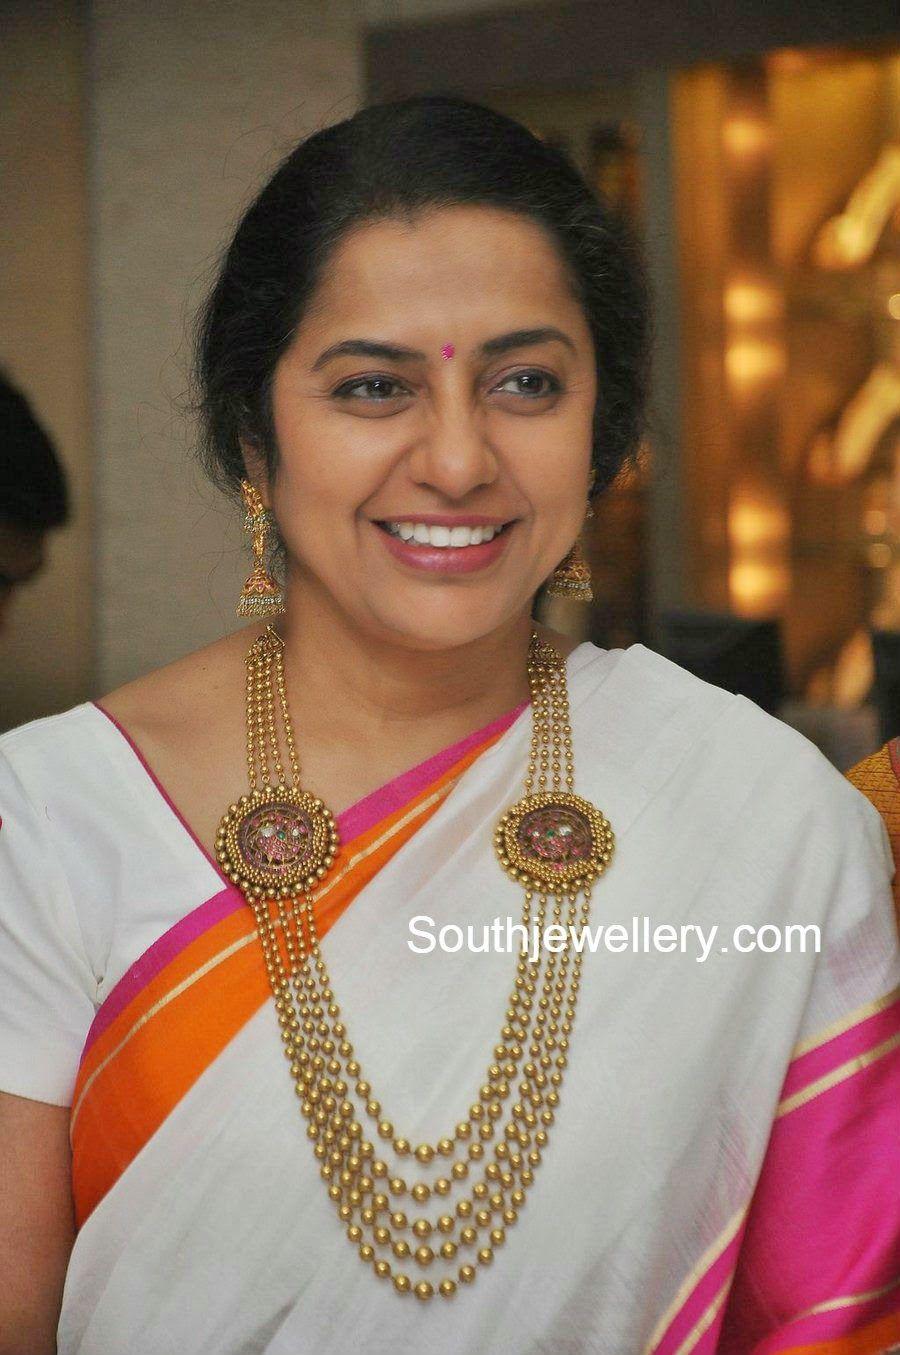 Suhasini in gundla haram jewellery designs - Suhasini In Gundla Haram